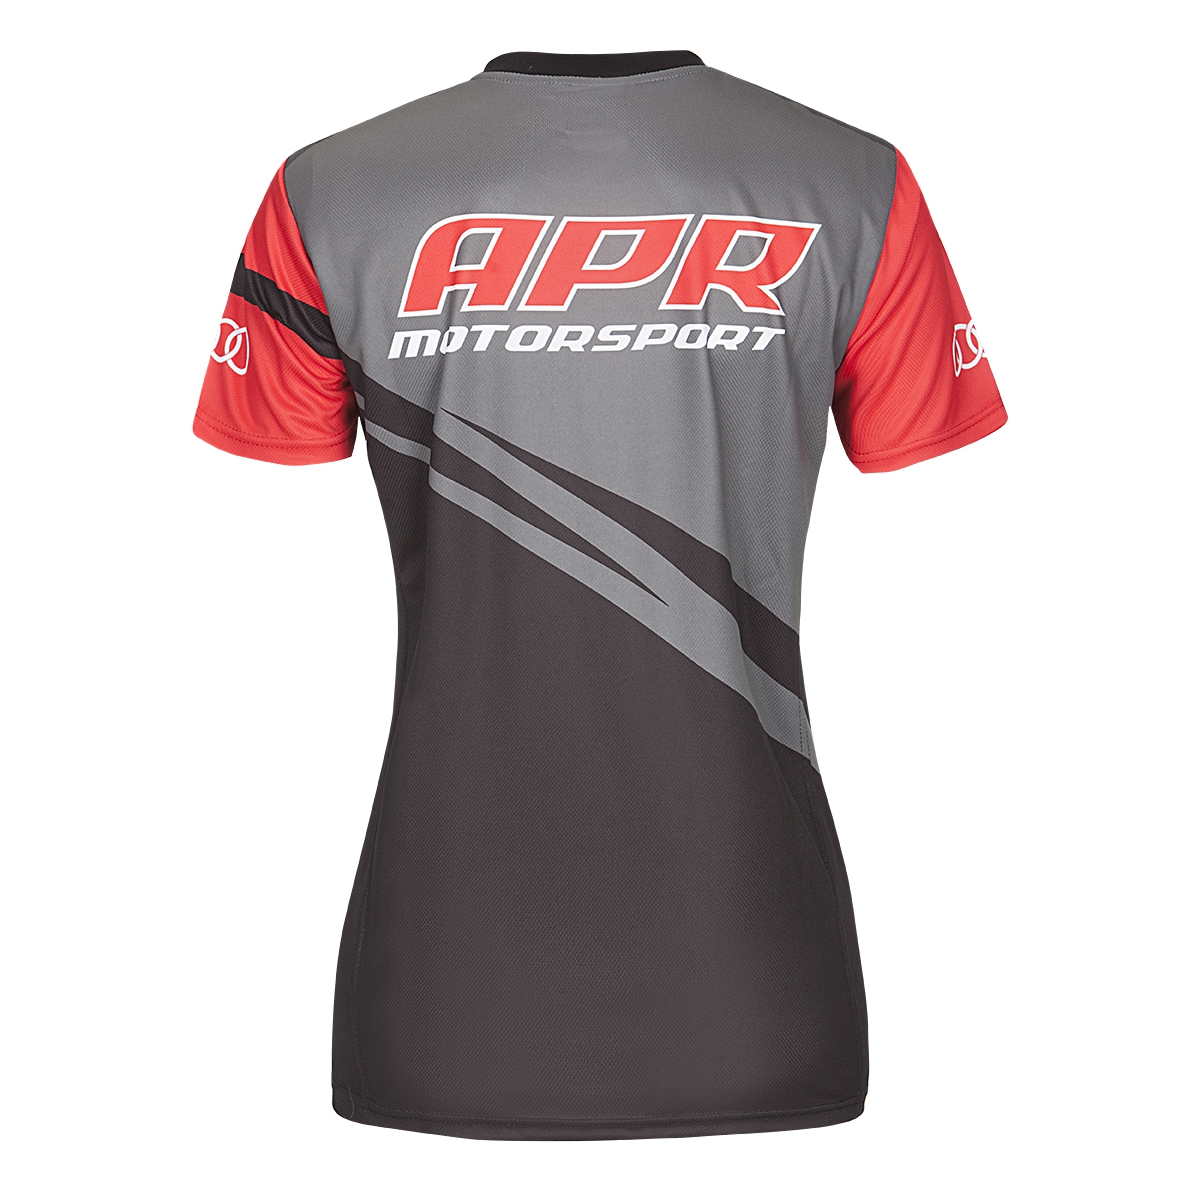 Funktionsshirt APR Motorsport